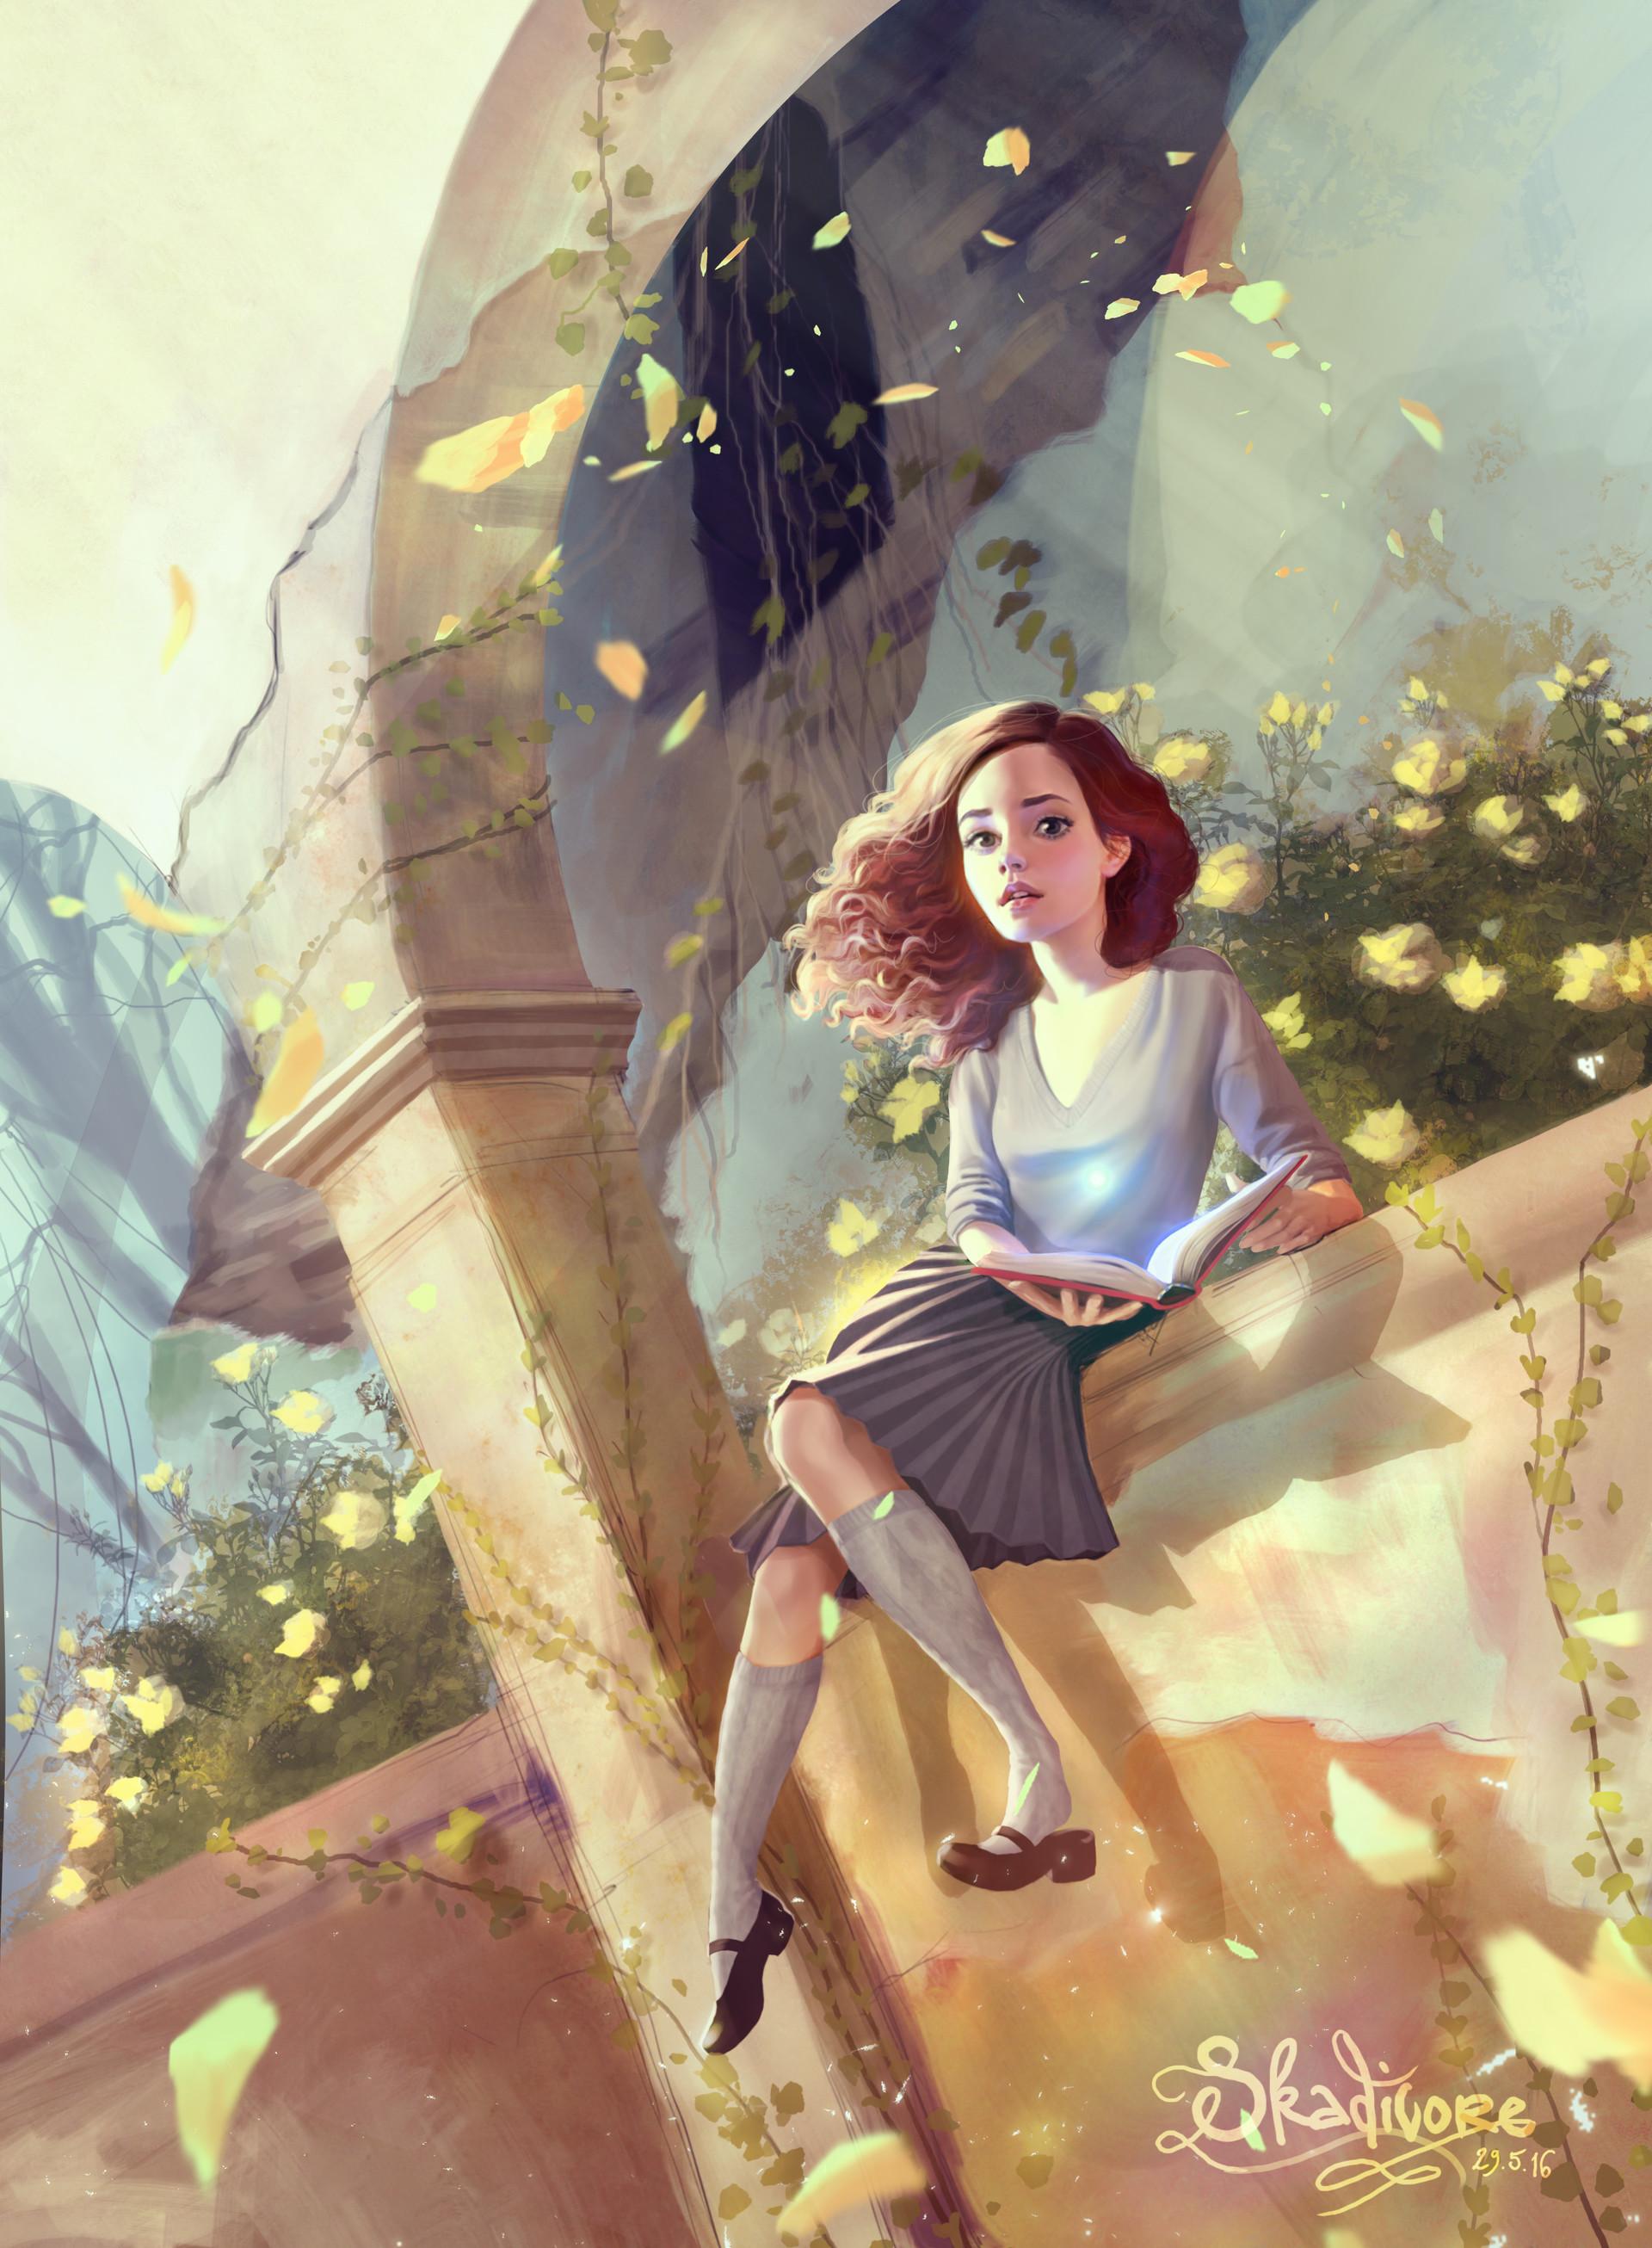 https://cdna.artstation.com/p/assets/images/images/002/743/462/large/pauline-voss-hermione-highres.jpg